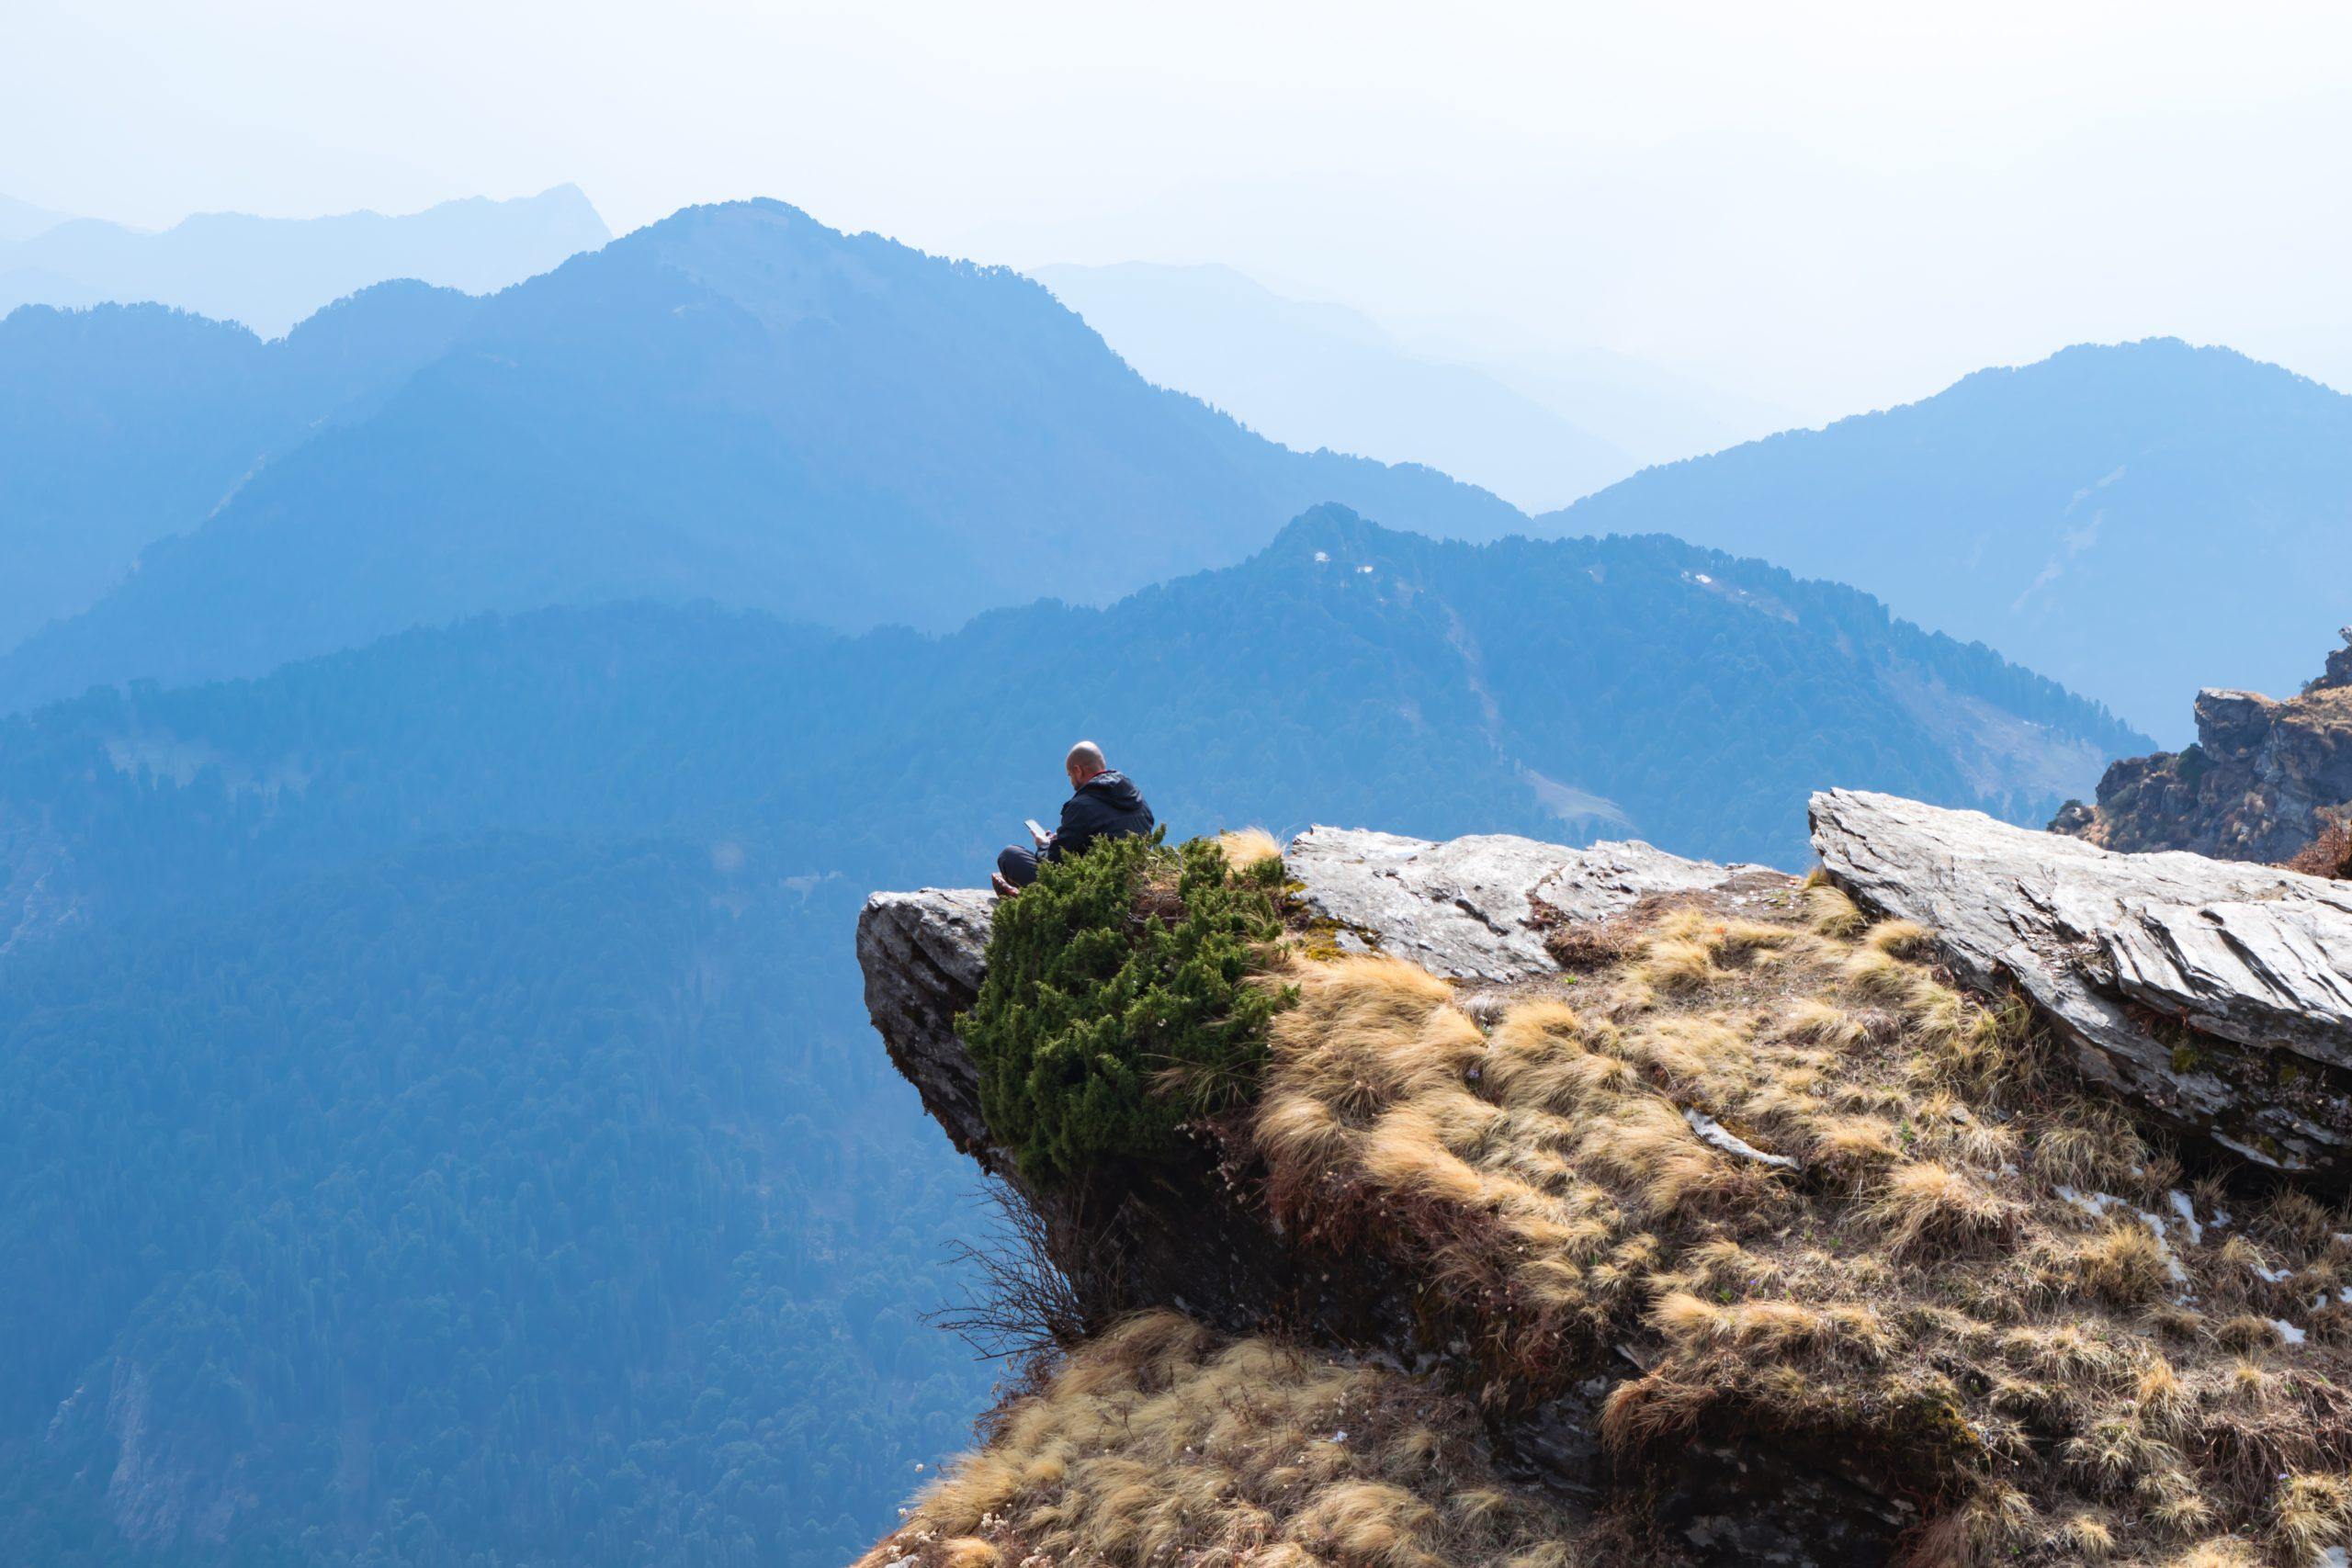 A person sitting on mountain edge